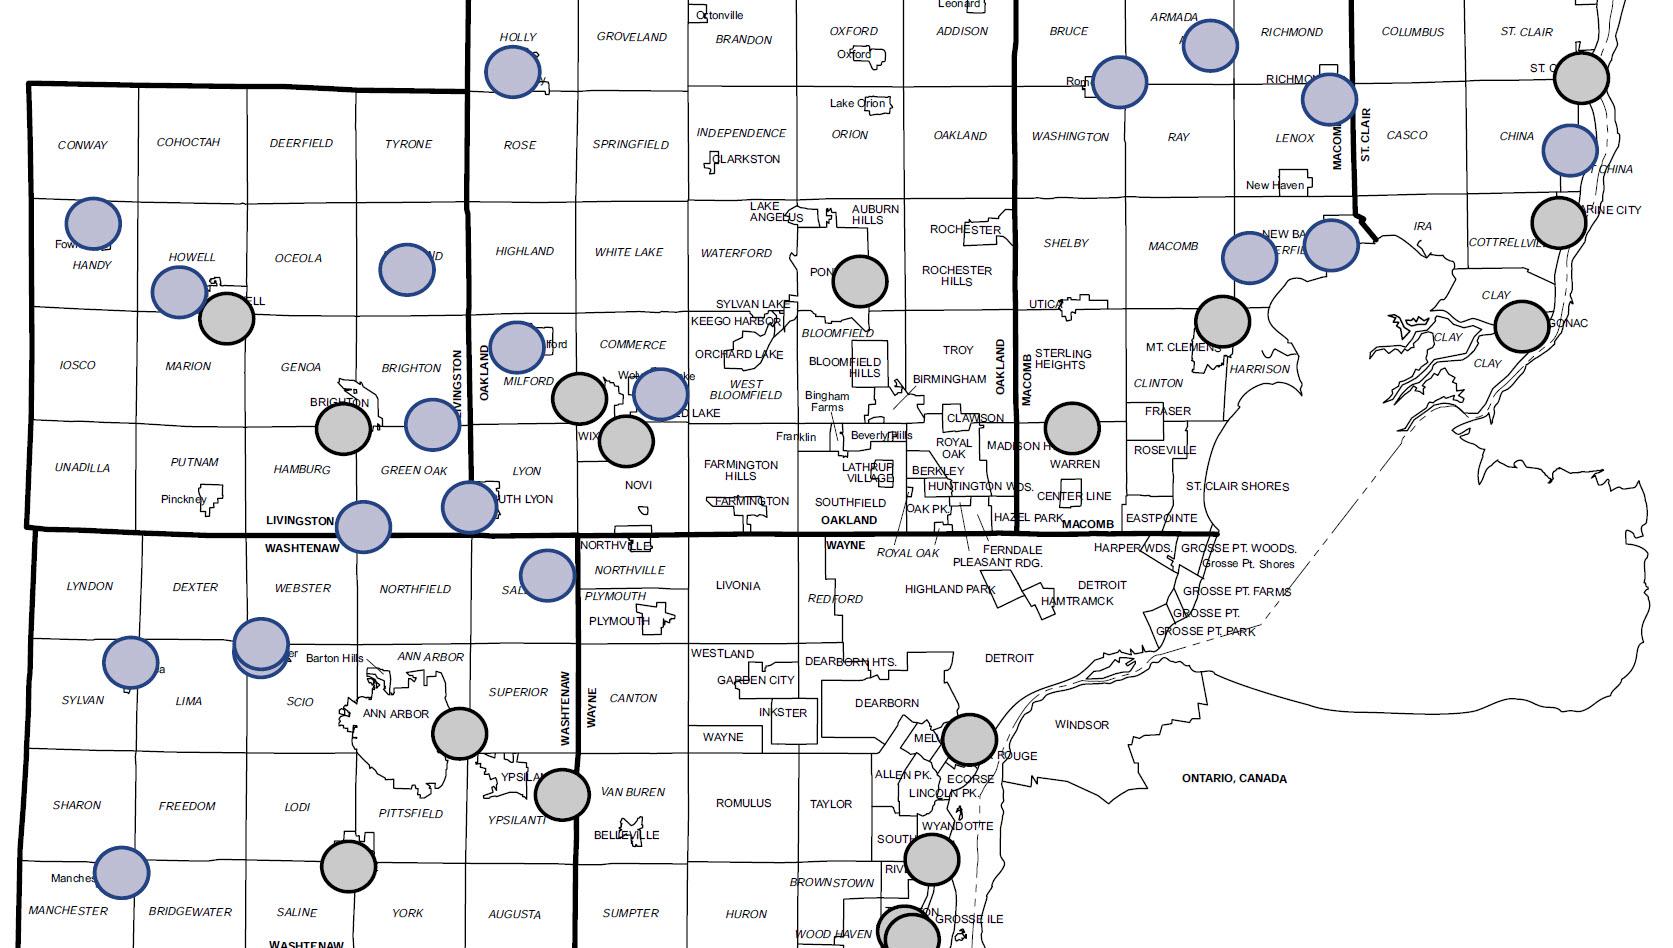 Warren Detroit Drainage Links